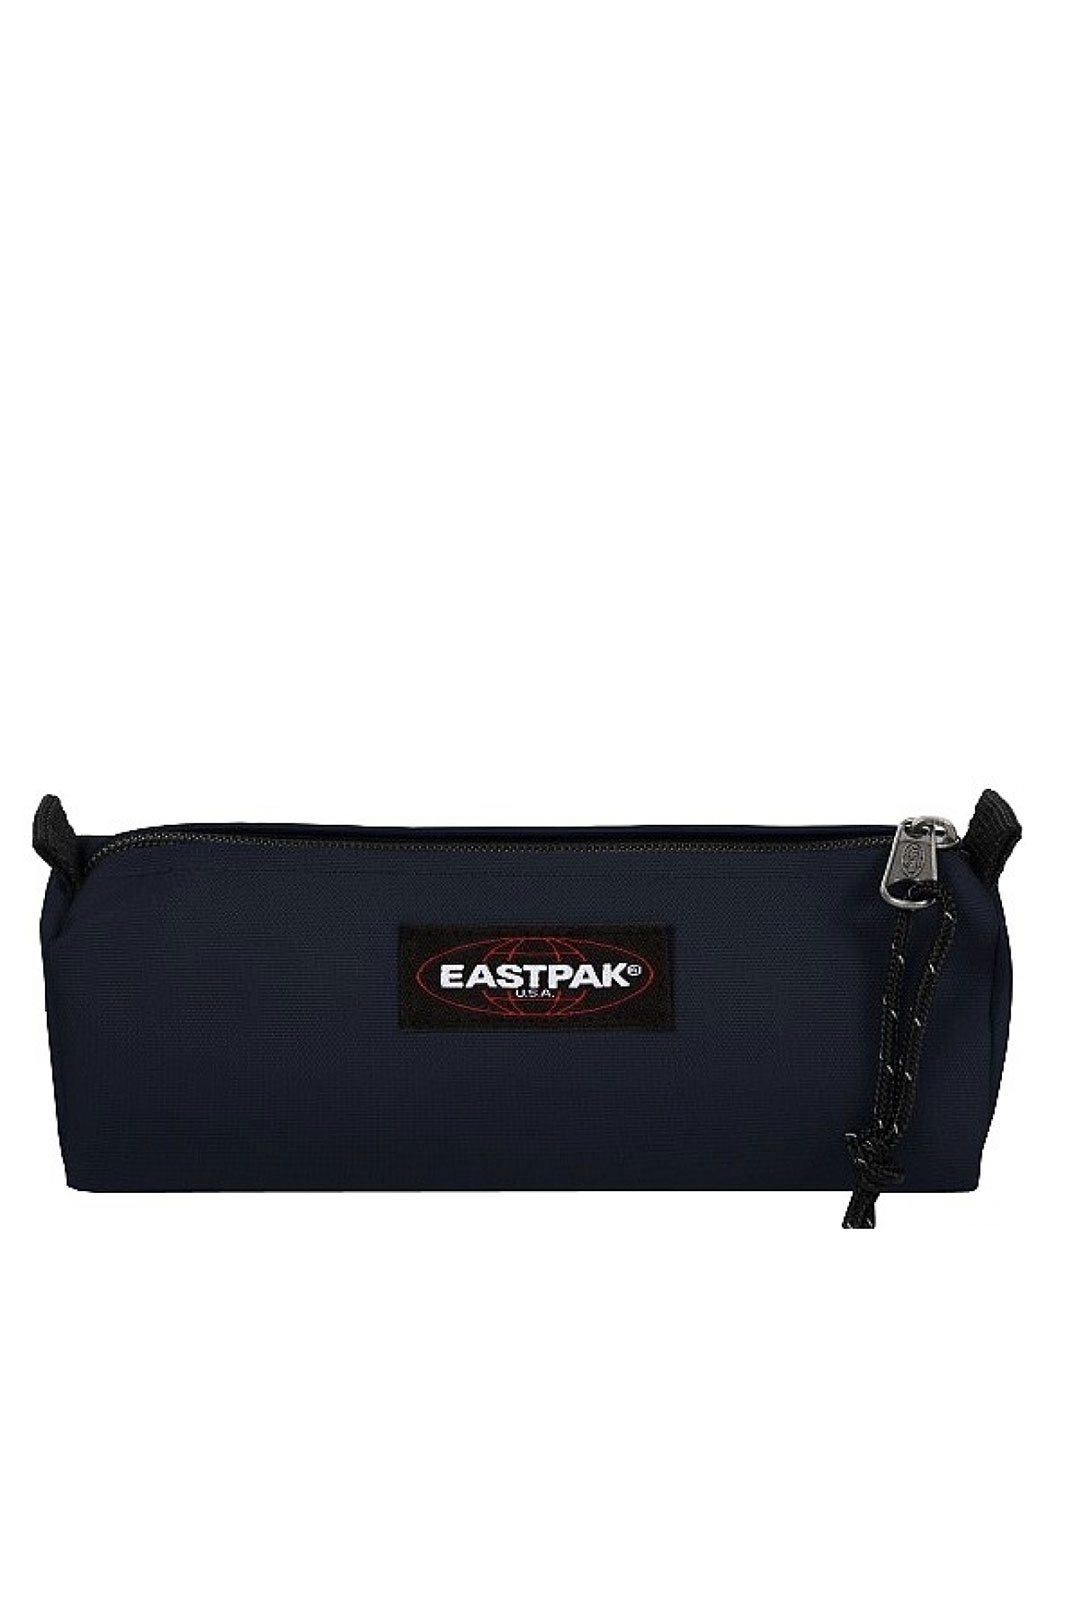 Etuis / Trousses  Eastpak EK37222S 22S bleu